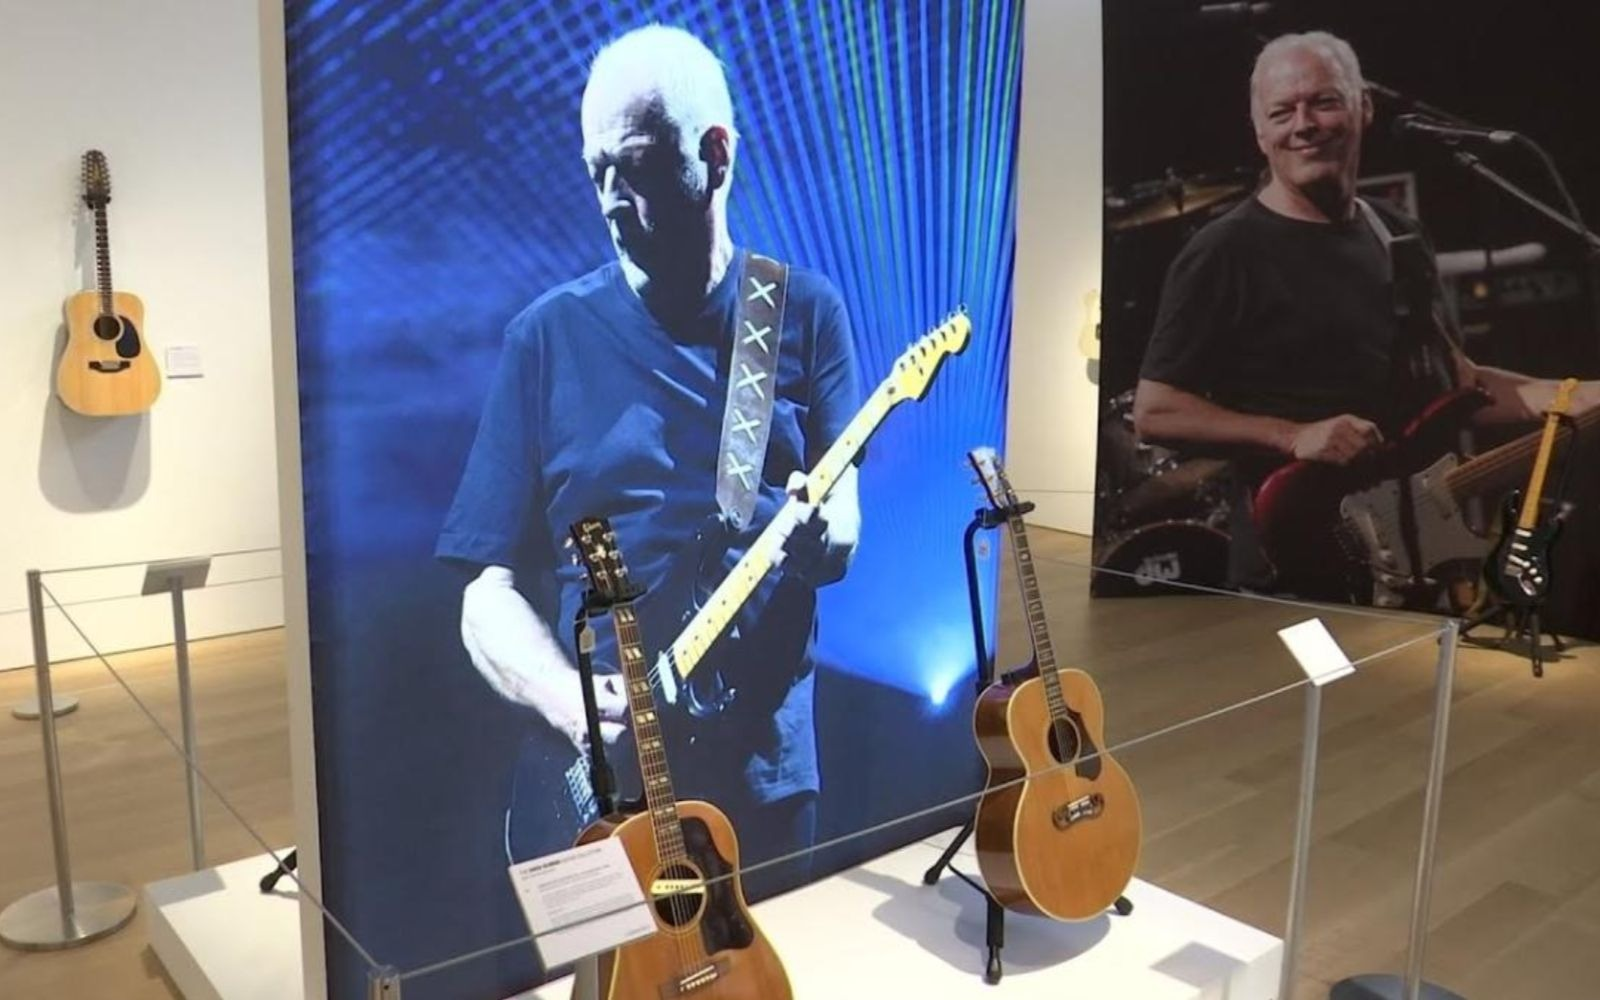 David Gilmour auction 2019